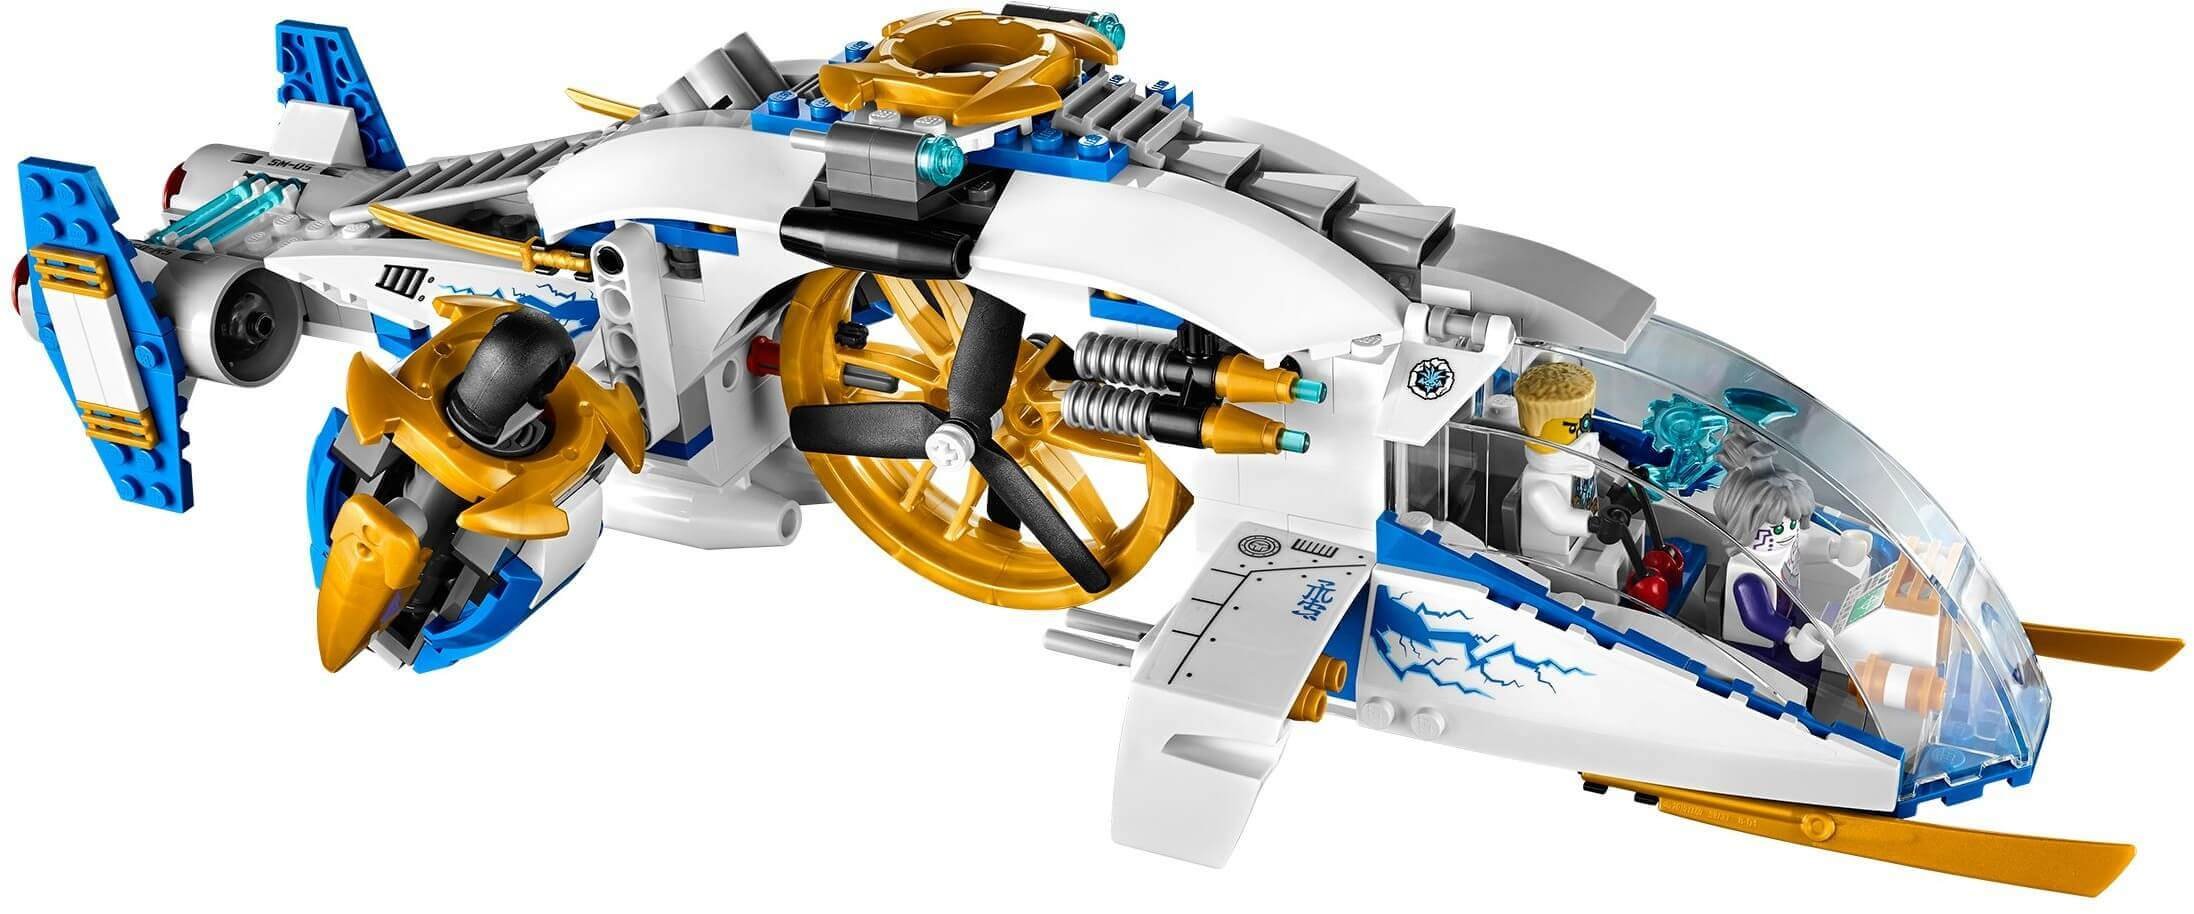 Mua đồ chơi LEGO 70724 - LEGO Ninjago 70724 - Siêu trực thăng NinjaCopter (LEGO Ninjago NinjaCopter 70724)